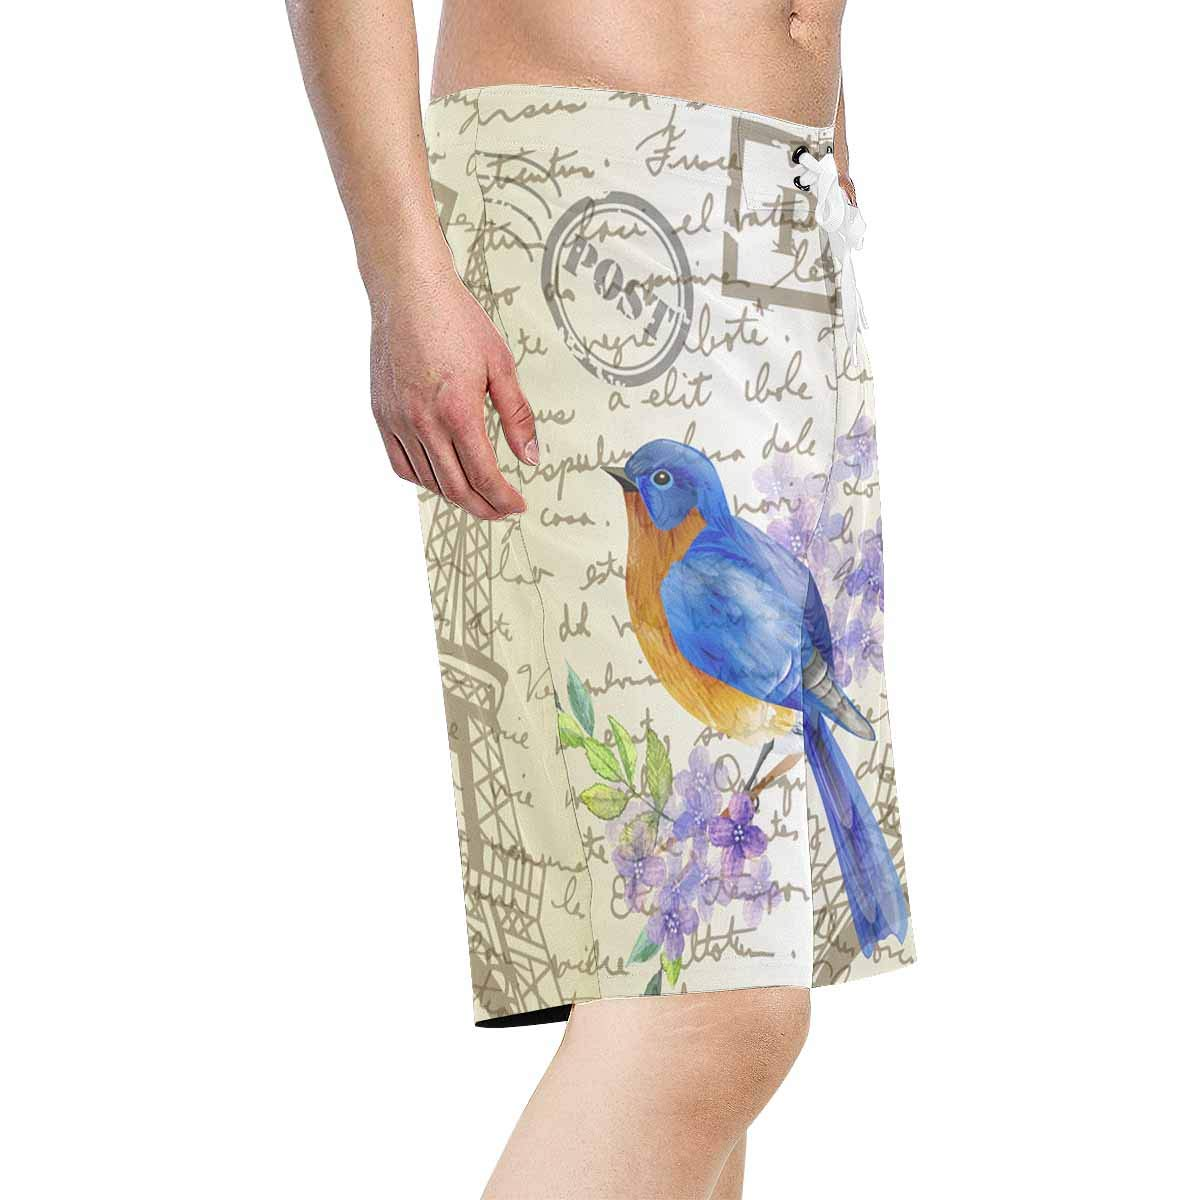 INTERESTPRINT Mens Board Shorts Sketching Paper Butterfly Quick Dry Swimwear Water Beach Shorts XS-6XL